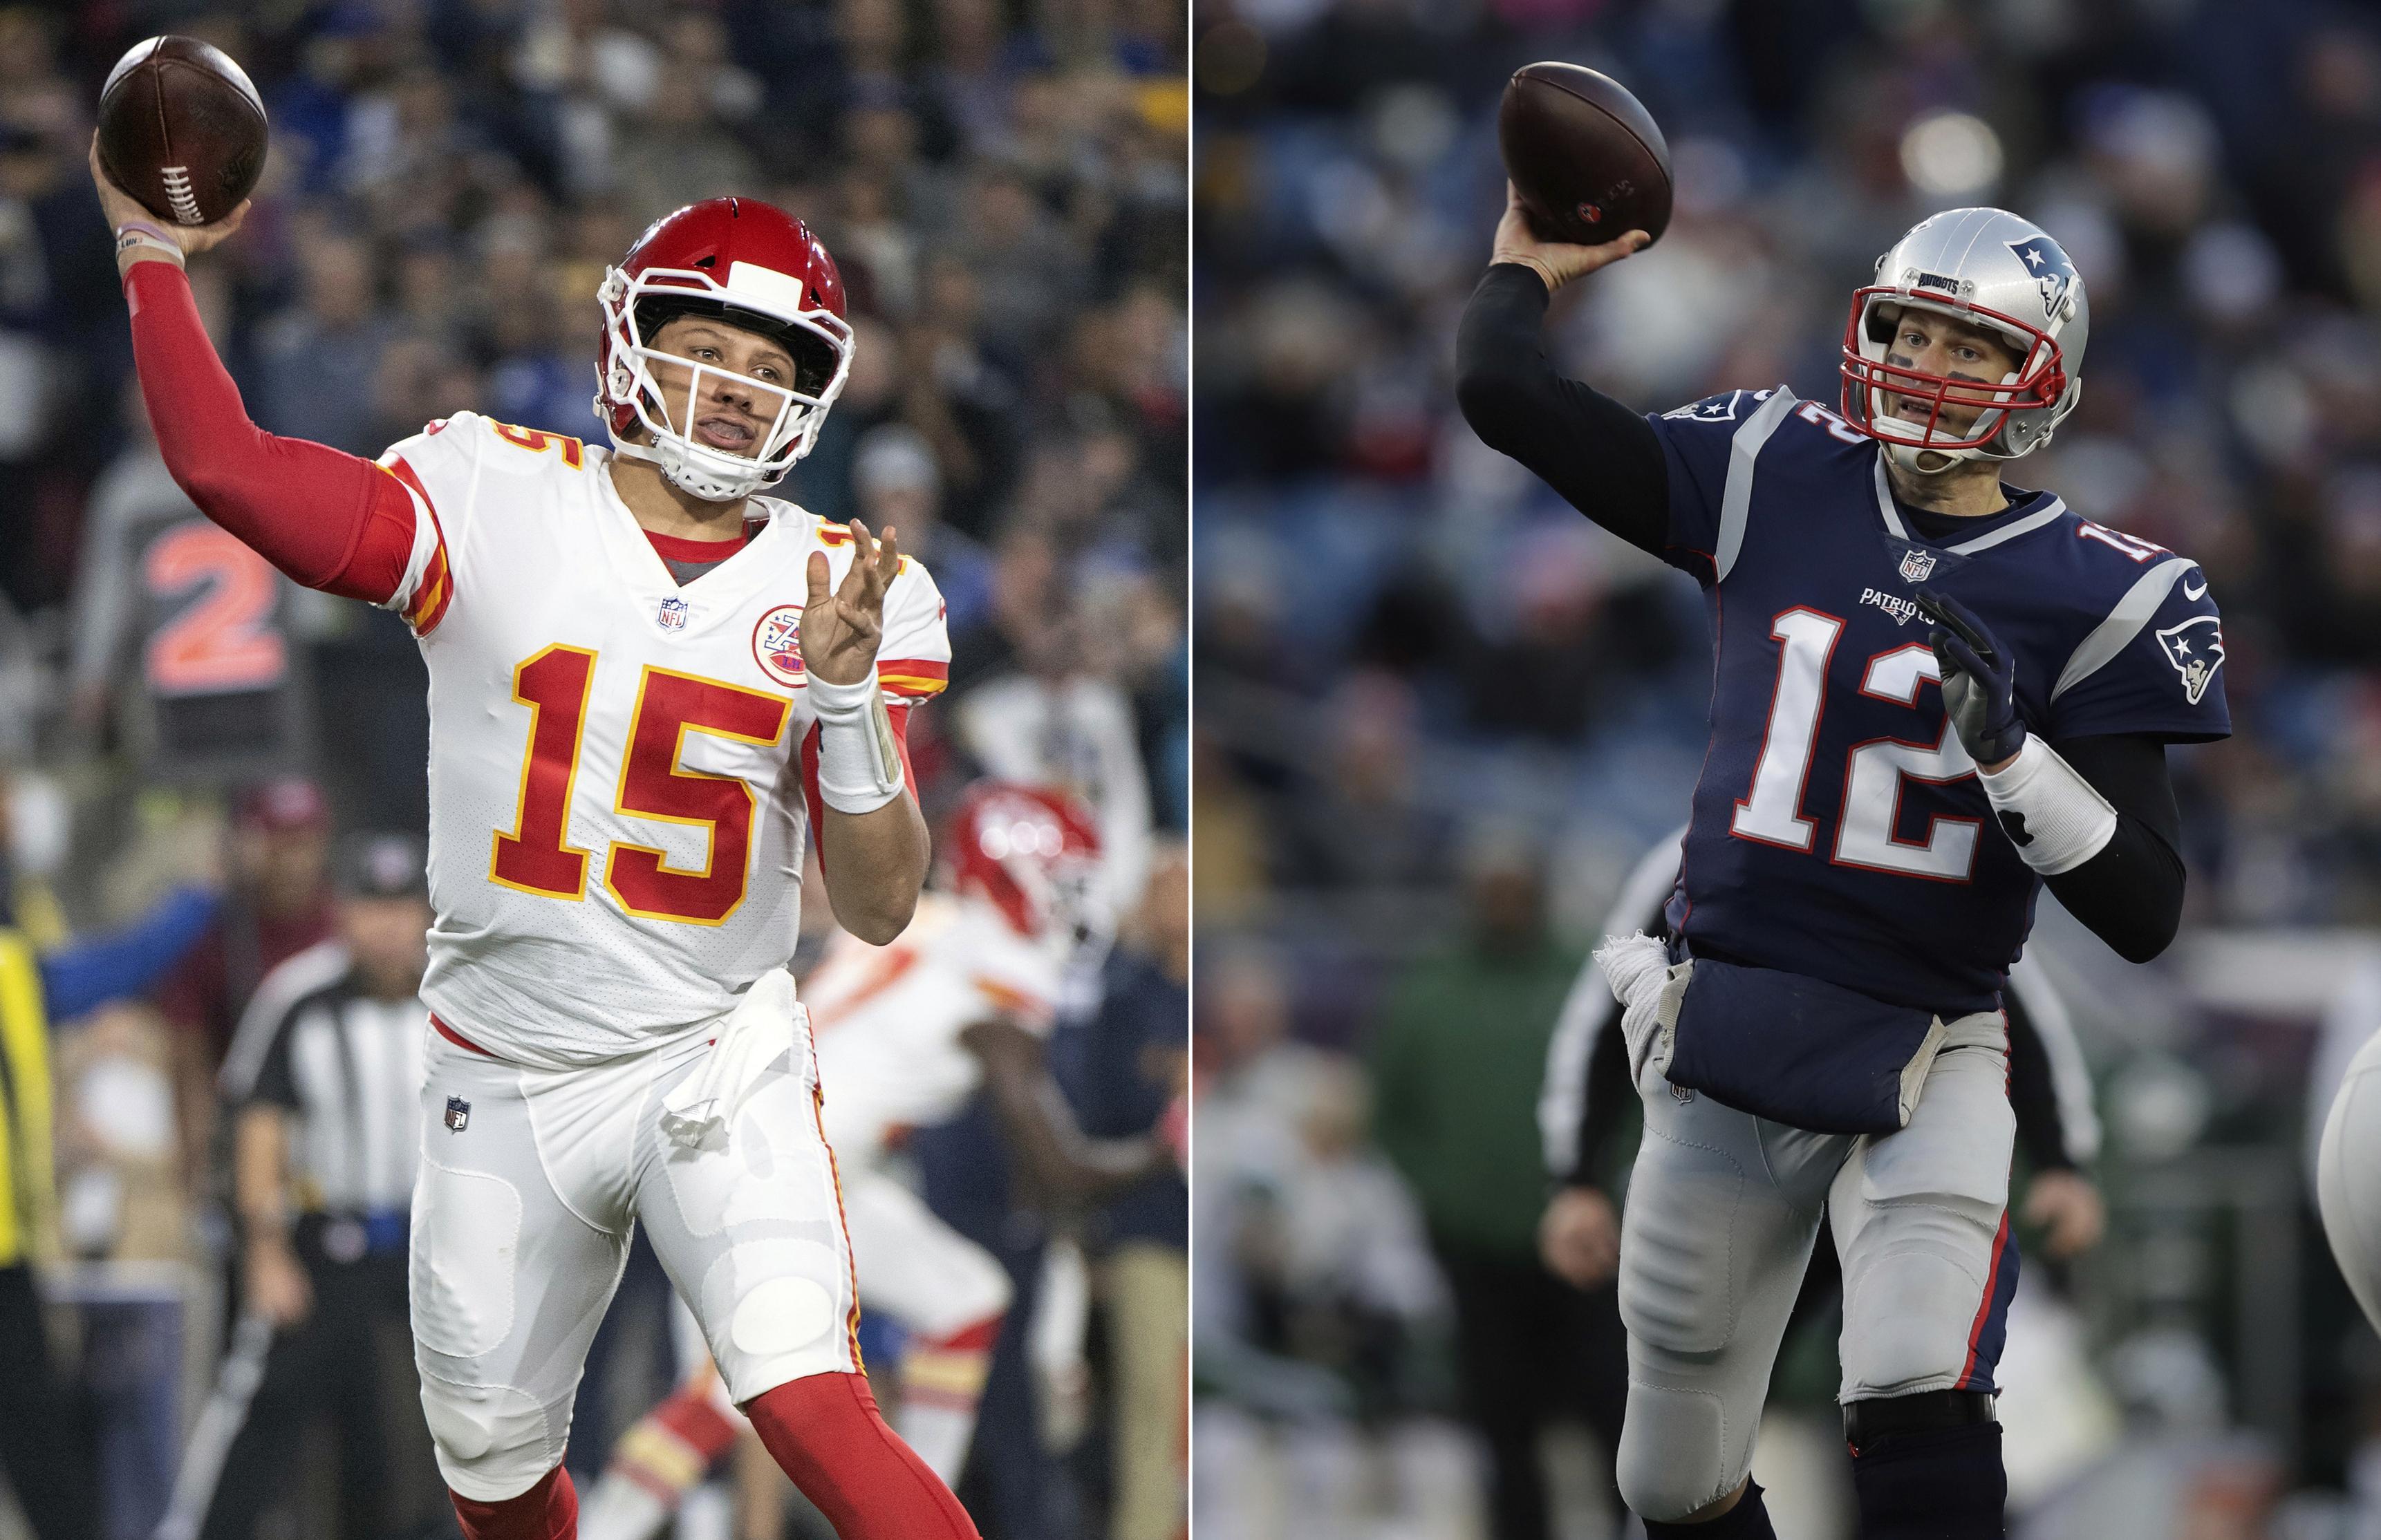 Patrick Mahomes (left) and Tom Brady (right) will be the battling quarterbacks on Sunday